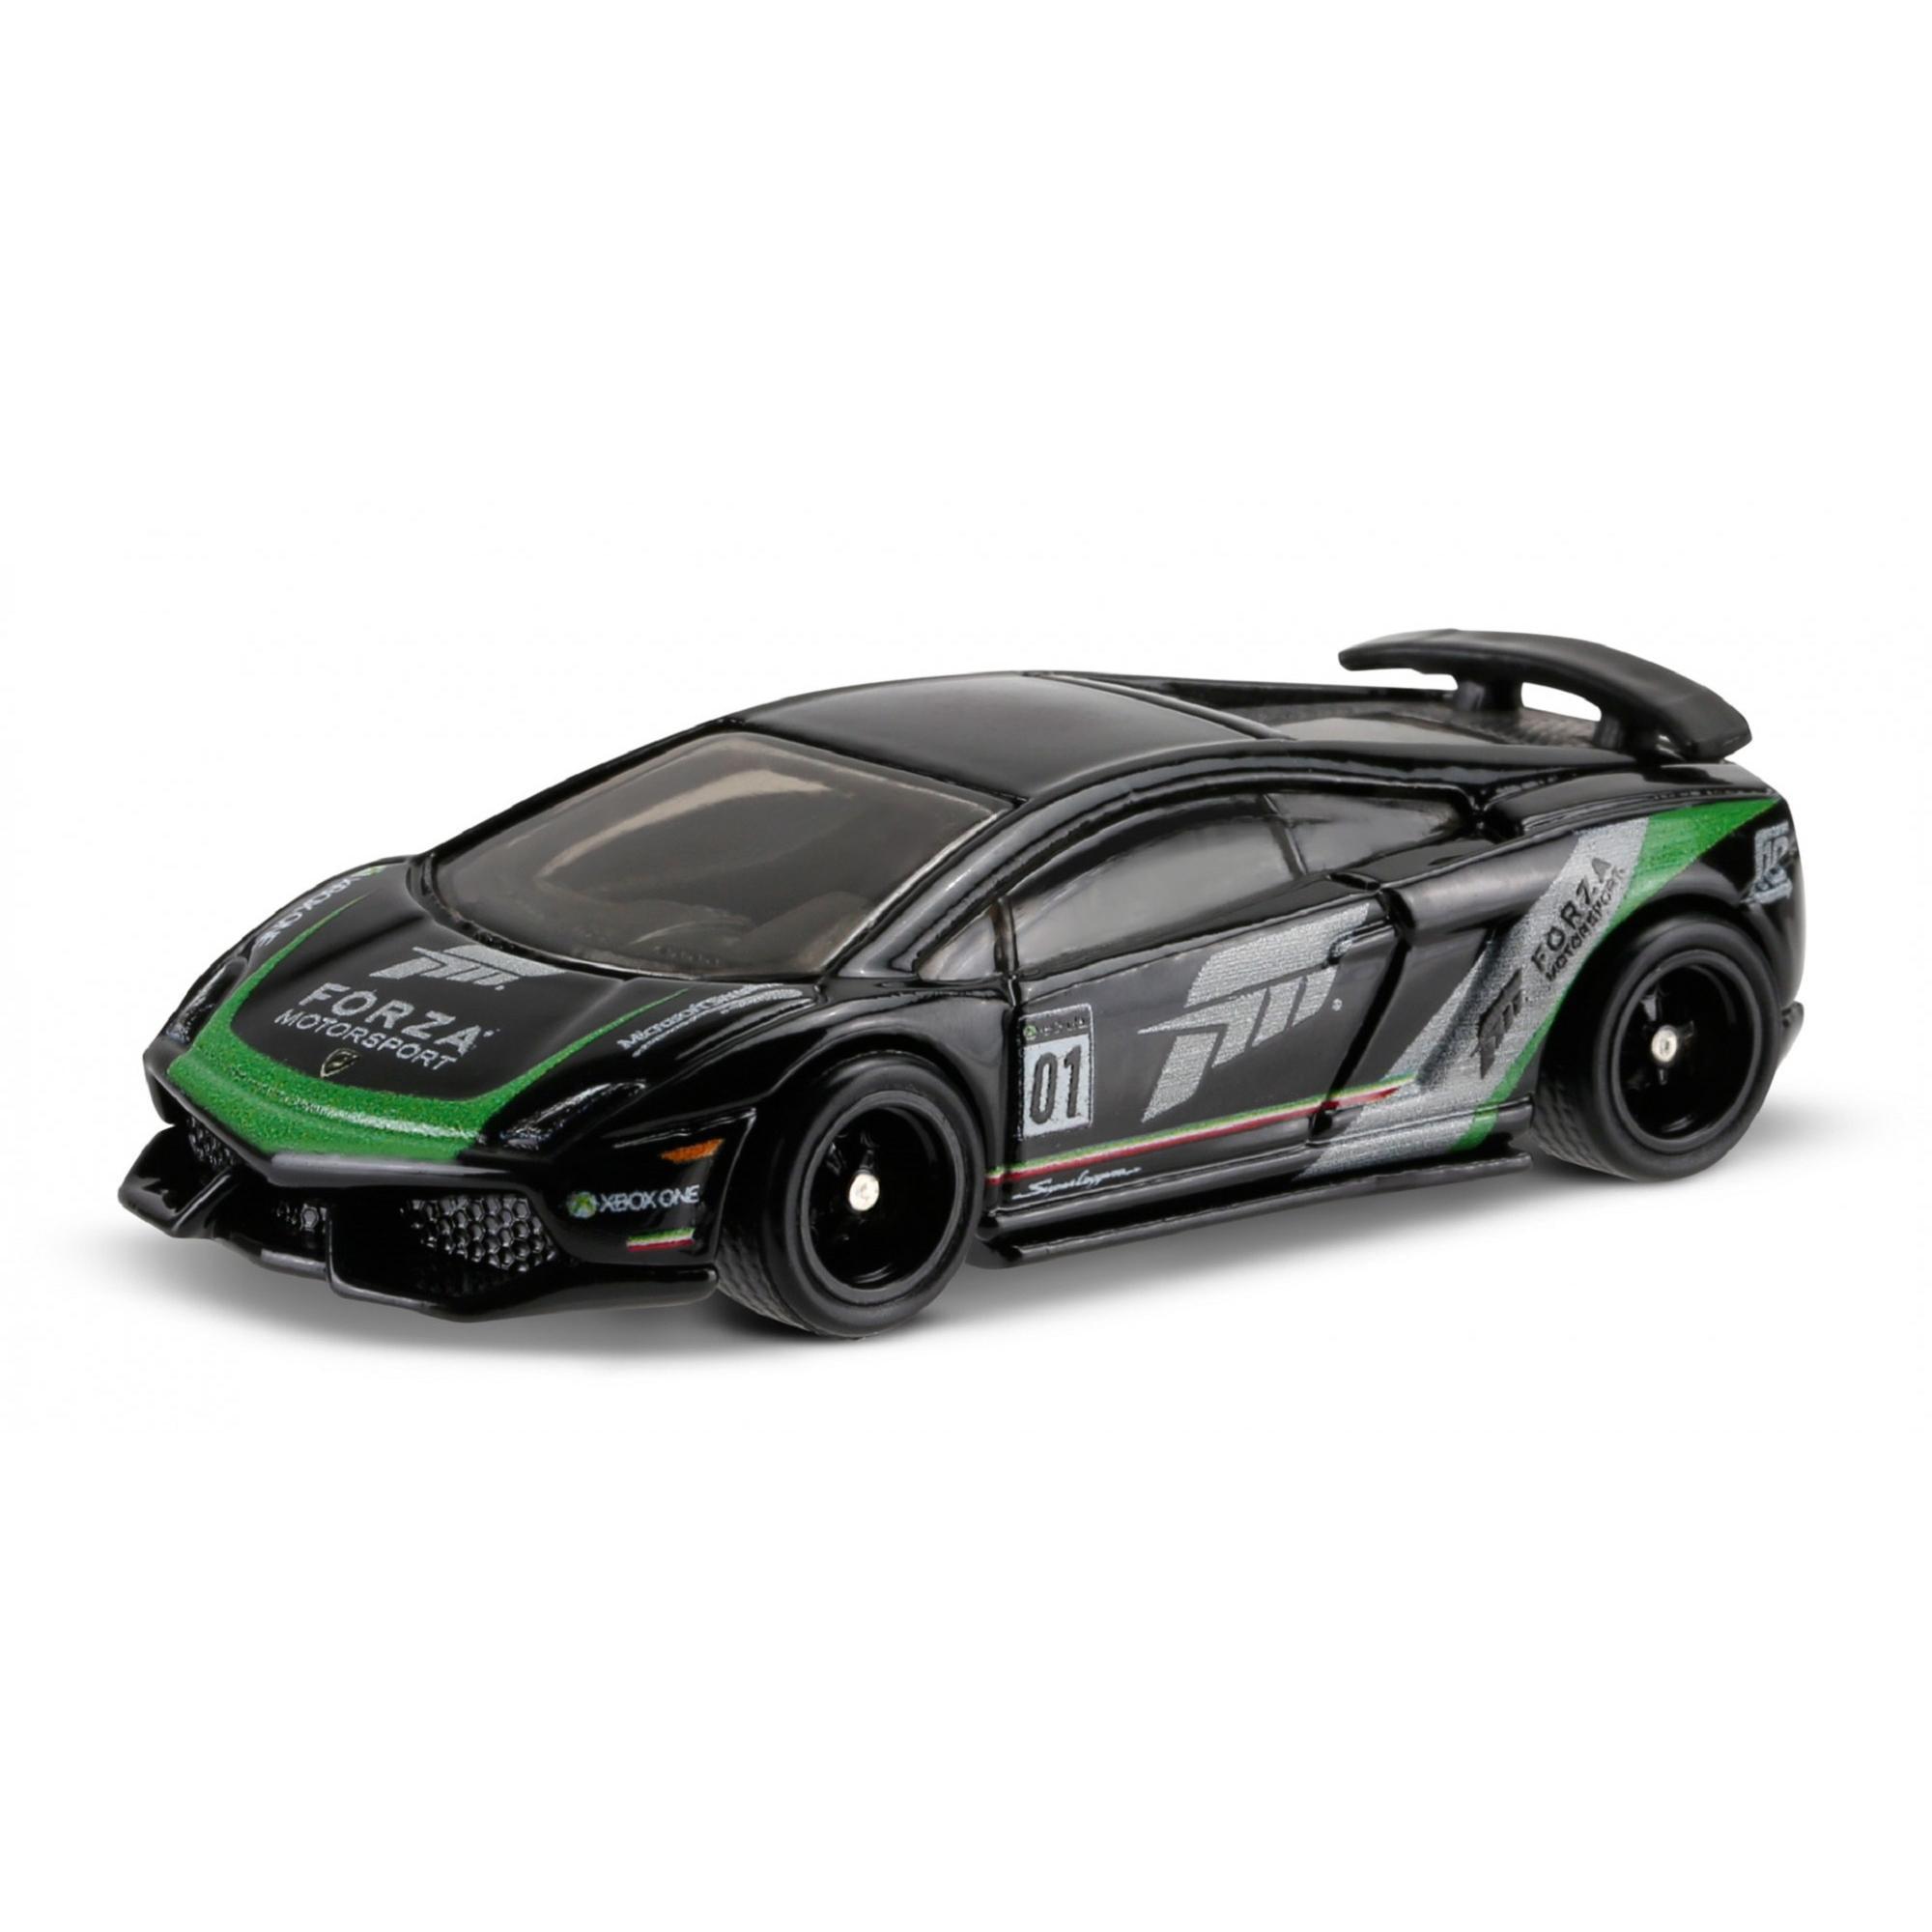 Hot Wheels Retro Entertainment Diecast Vehicle, Lamborghini Gallardo LP570 Supperlegera by Mattel